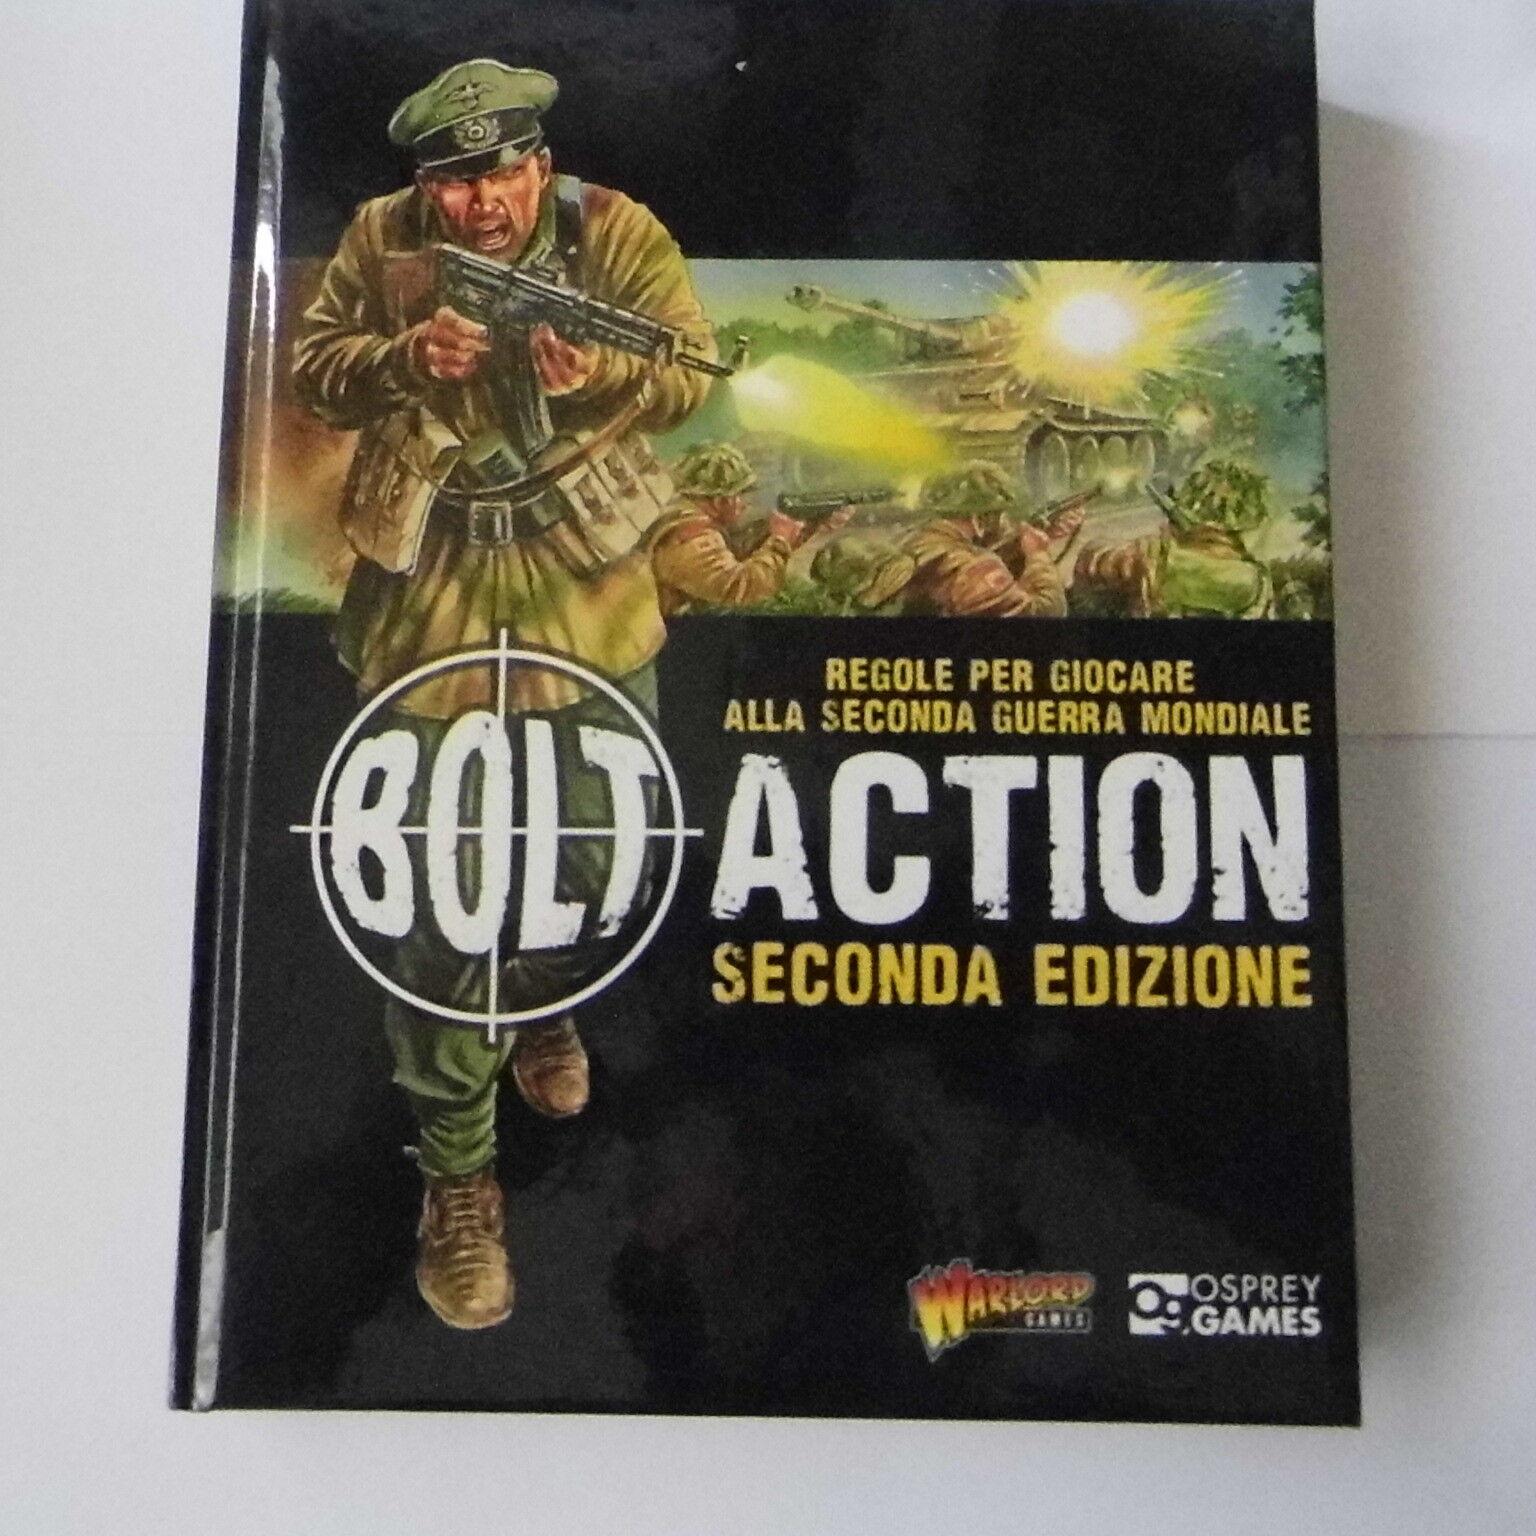 BOLT ACTION WORLD WAR II SECONDA EDIZIONE (ITALIAN TEXT) - WARLORD GAMES